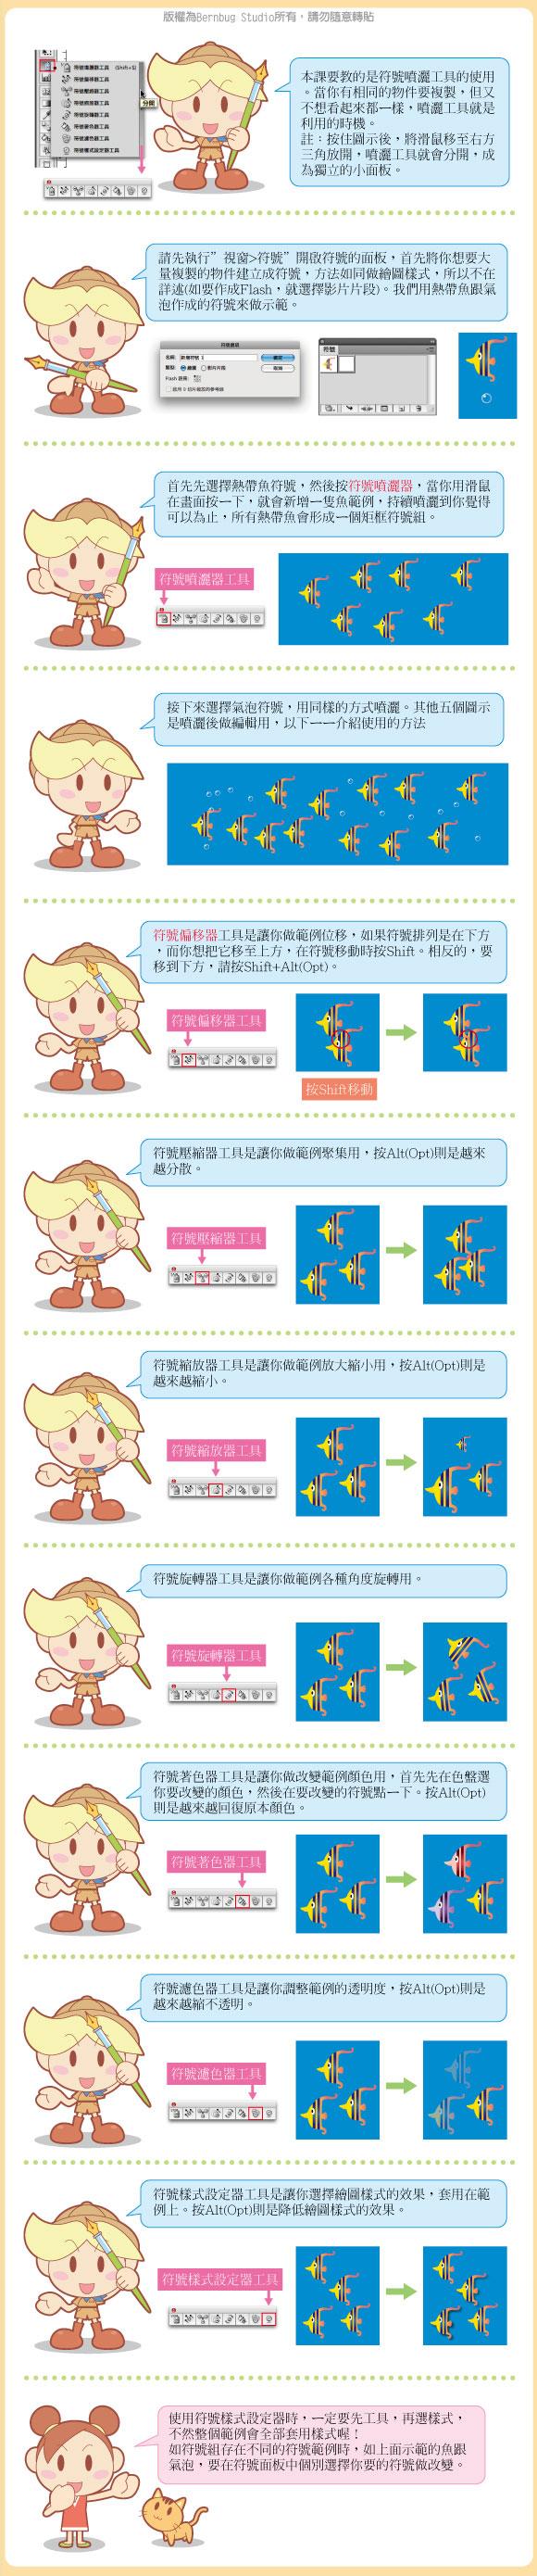 lesson14.jpg